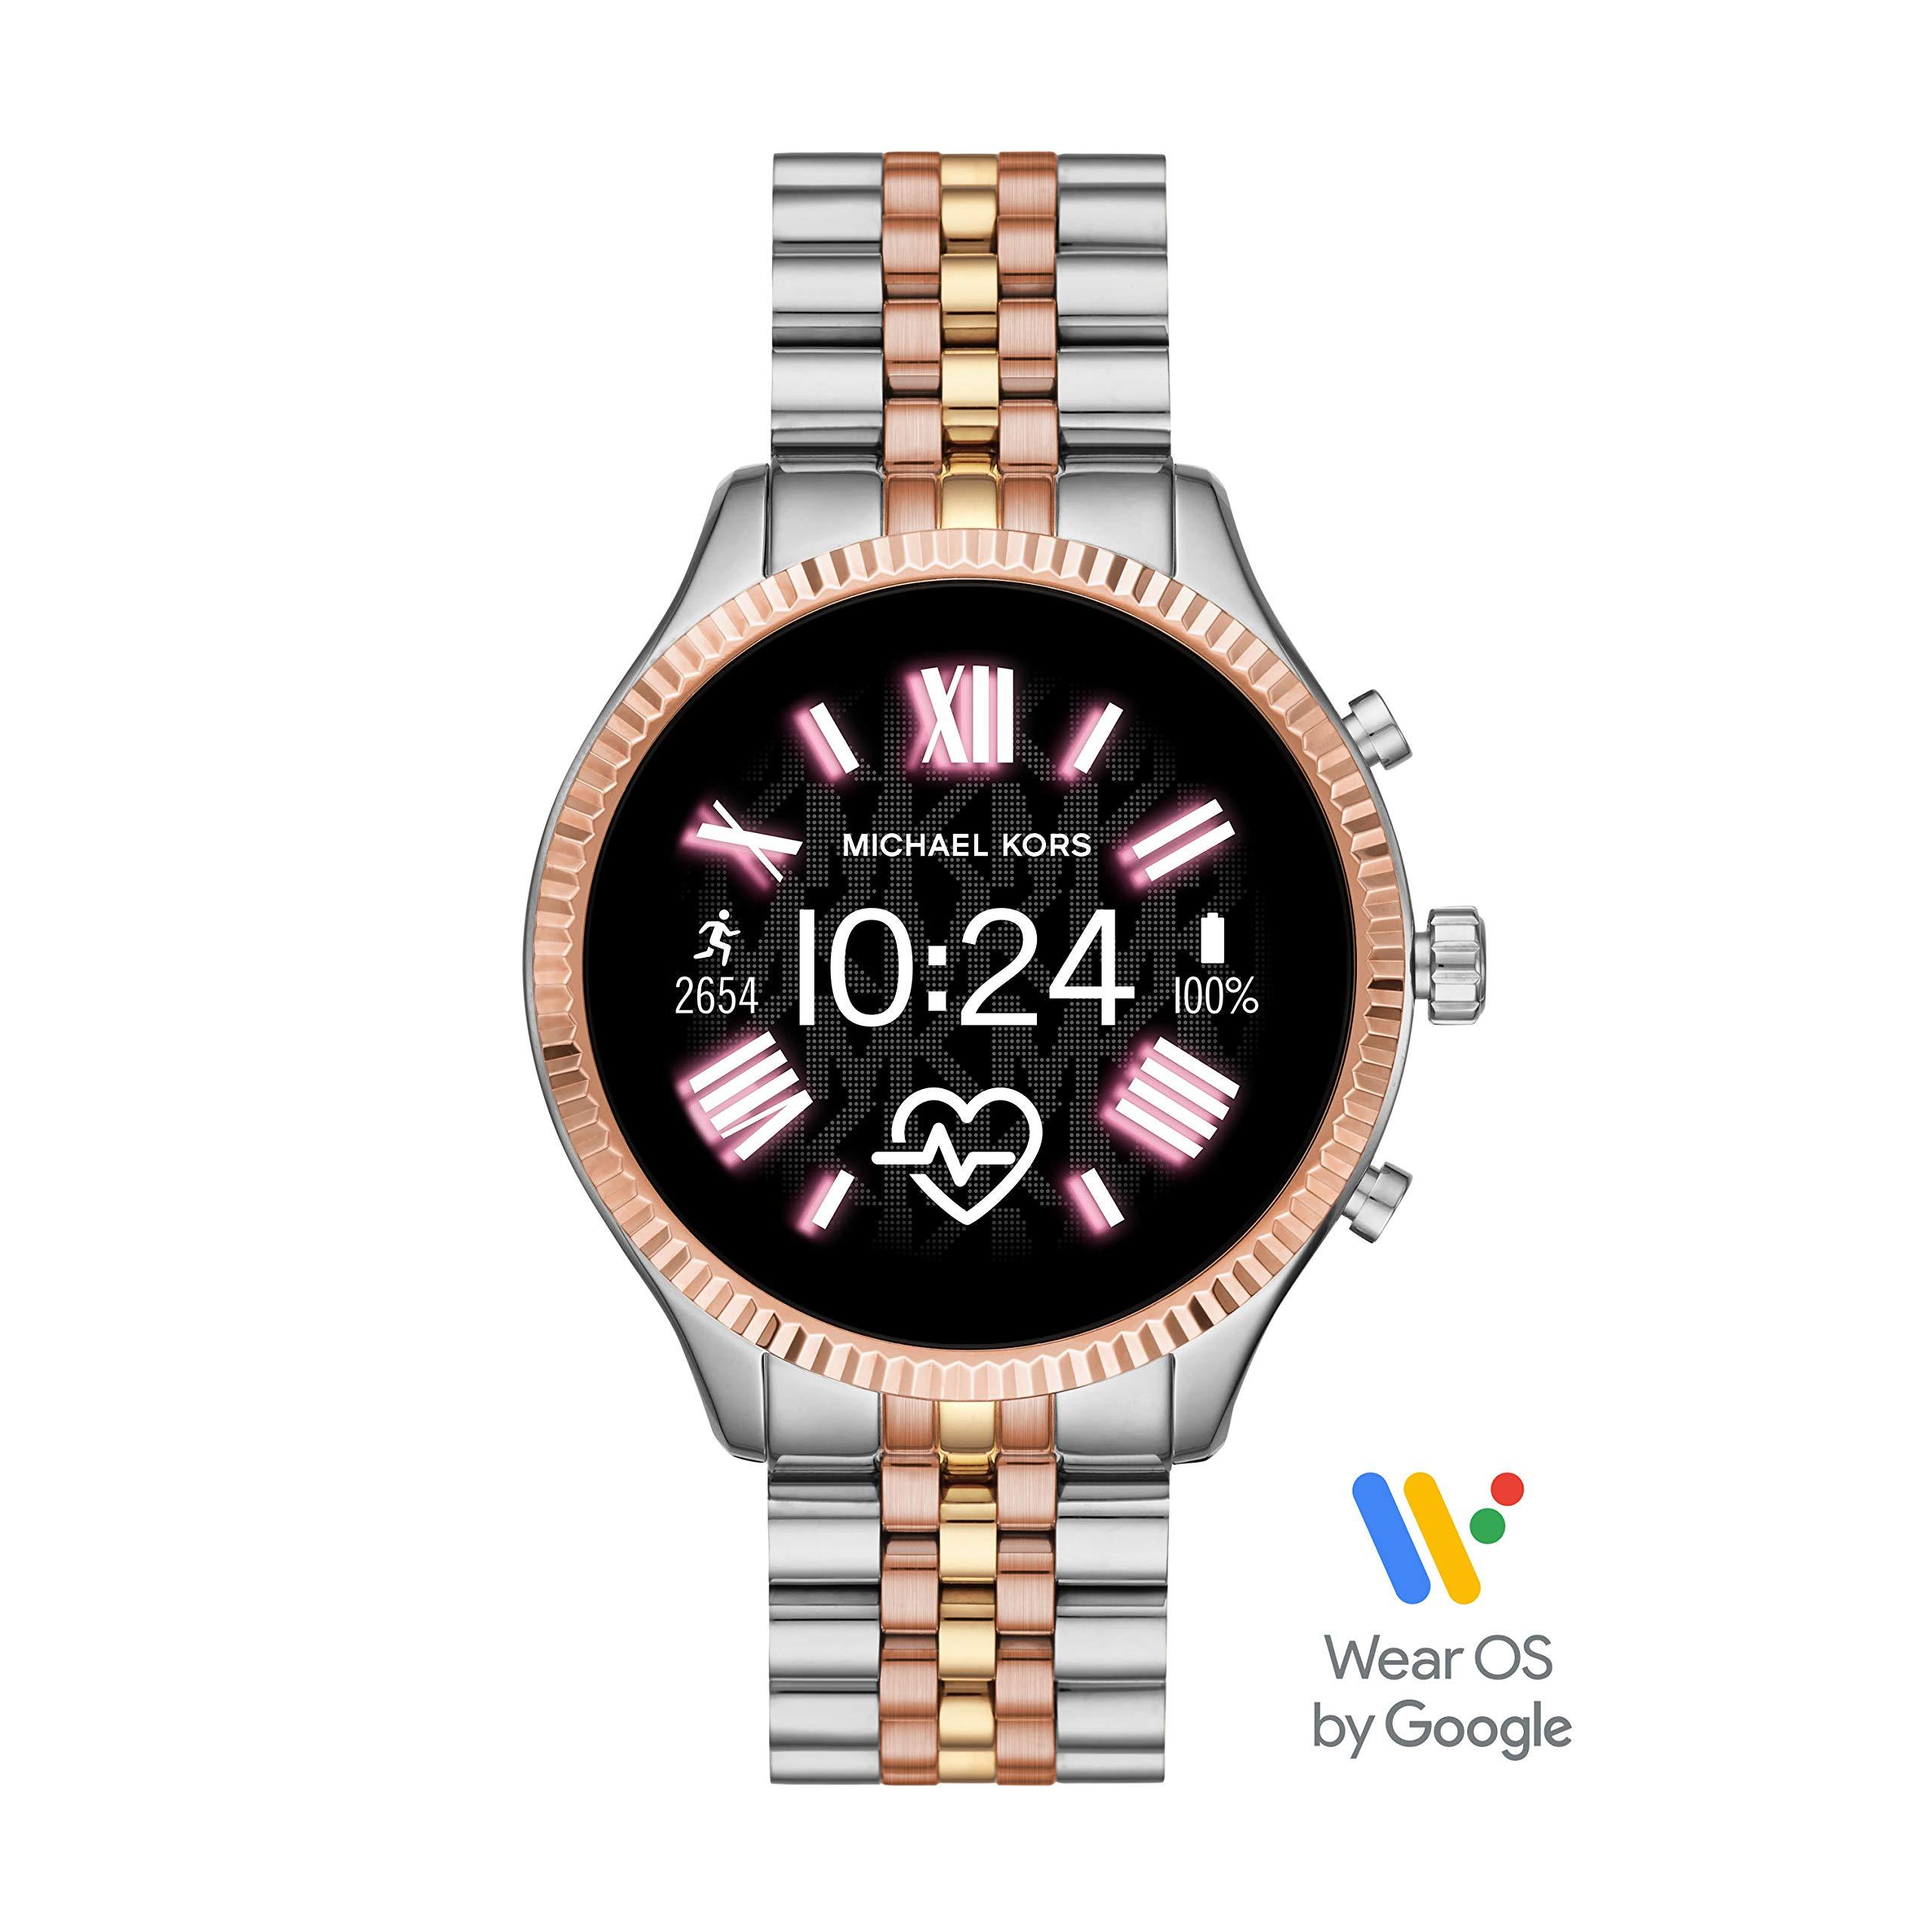 Michael Kors Access Lexington 2 Touchscreen Stainless Steel Smartwatch, Tri-Tone Rose/Gold/silver-MKT5080 by Michael Kors